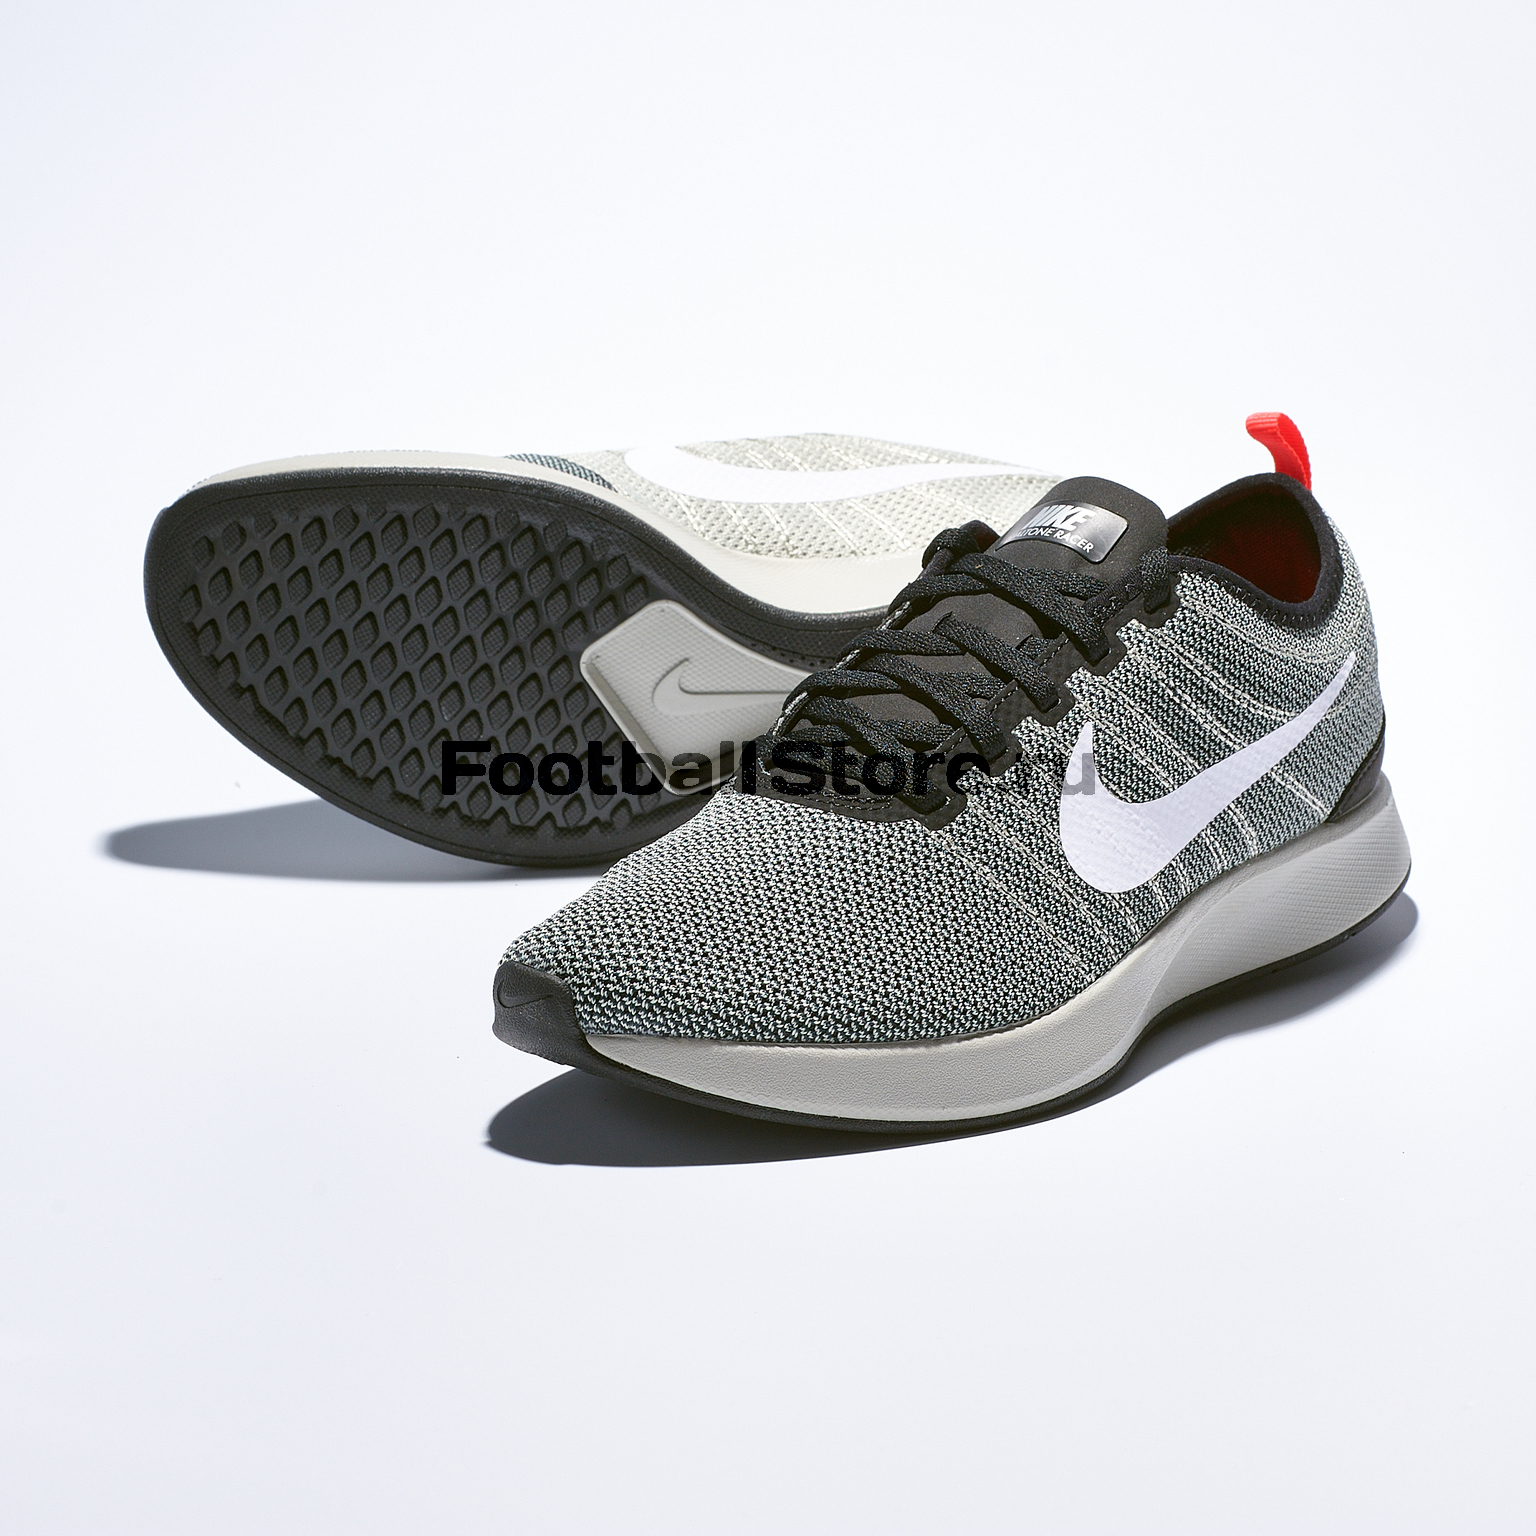 Кроссовки Nike Dualtone Racer 918227-001 кроссовки nike 3 0 580392 001 418 616 700 008 404 414